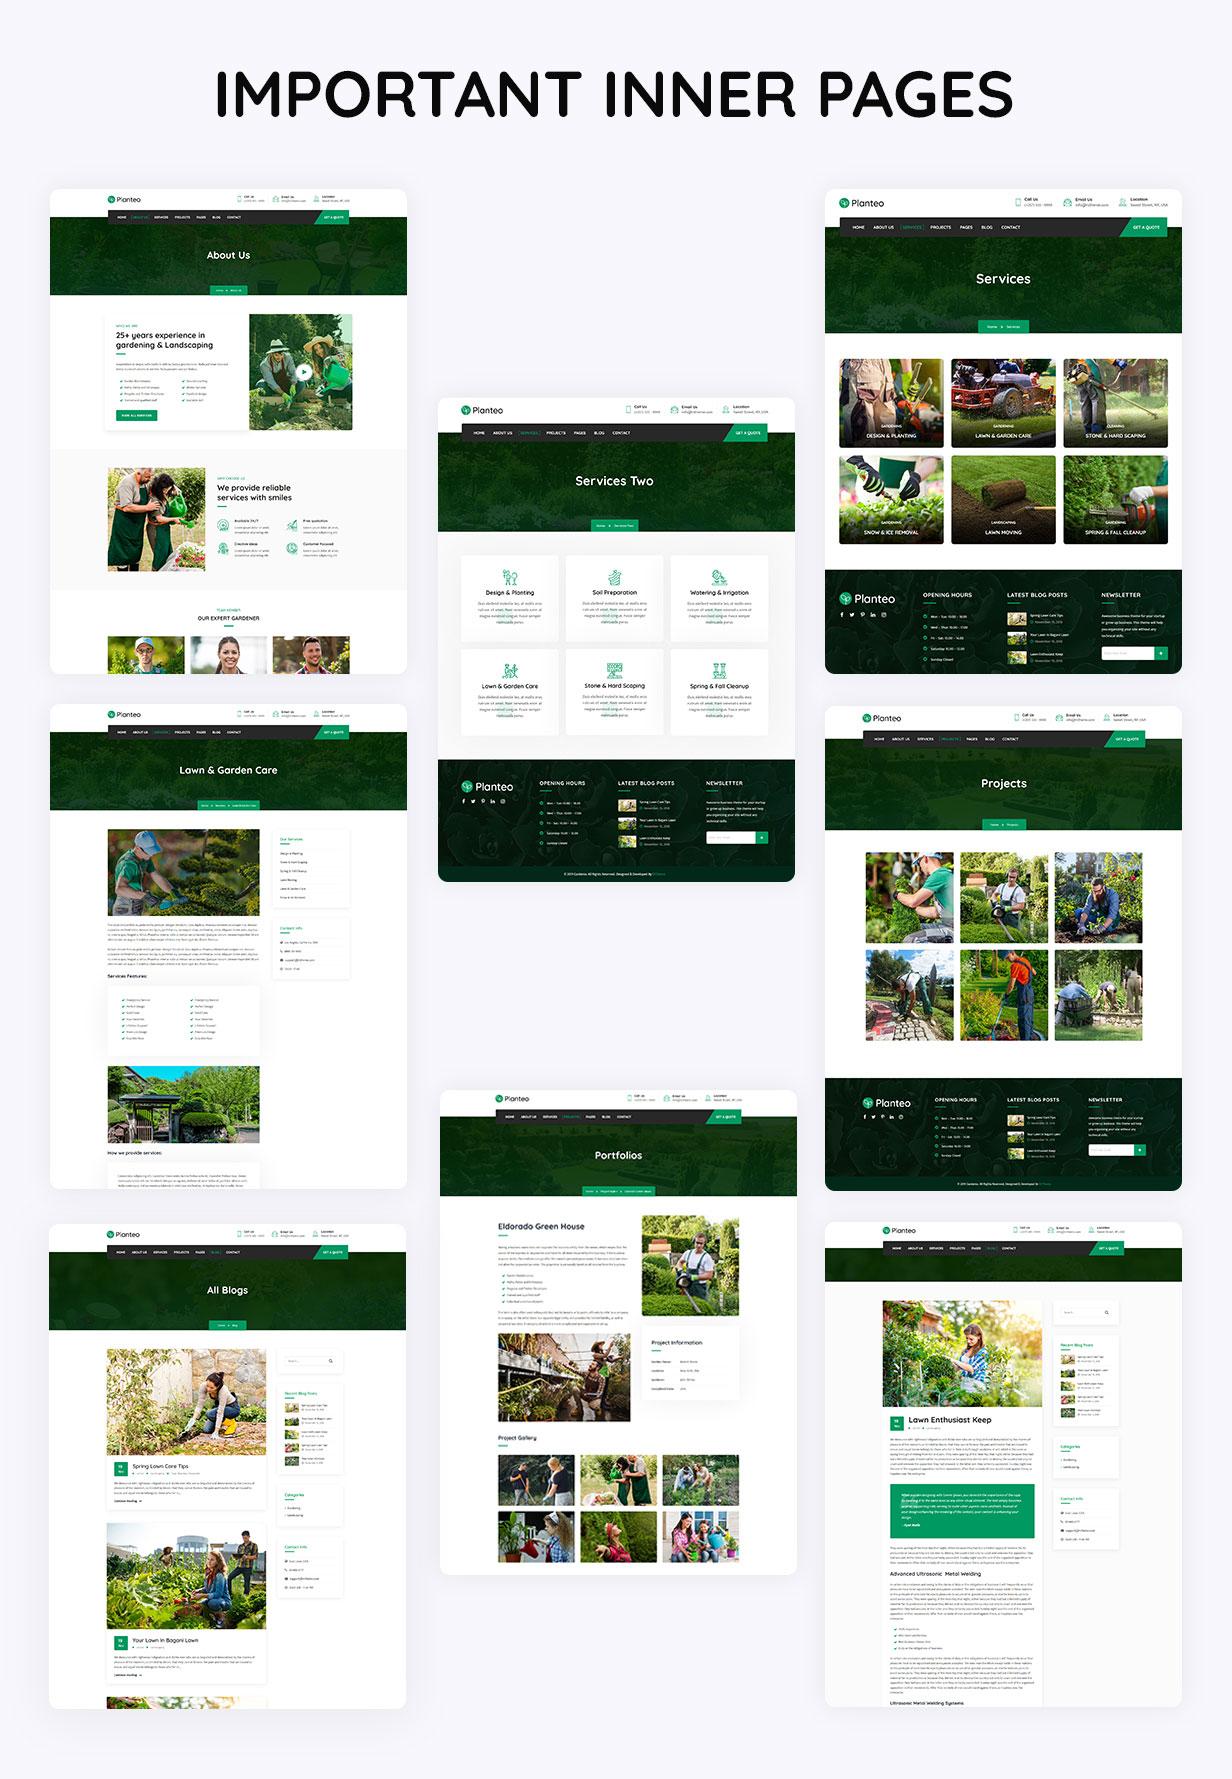 Planteo-Gardening and Landscaping WordPress Theme